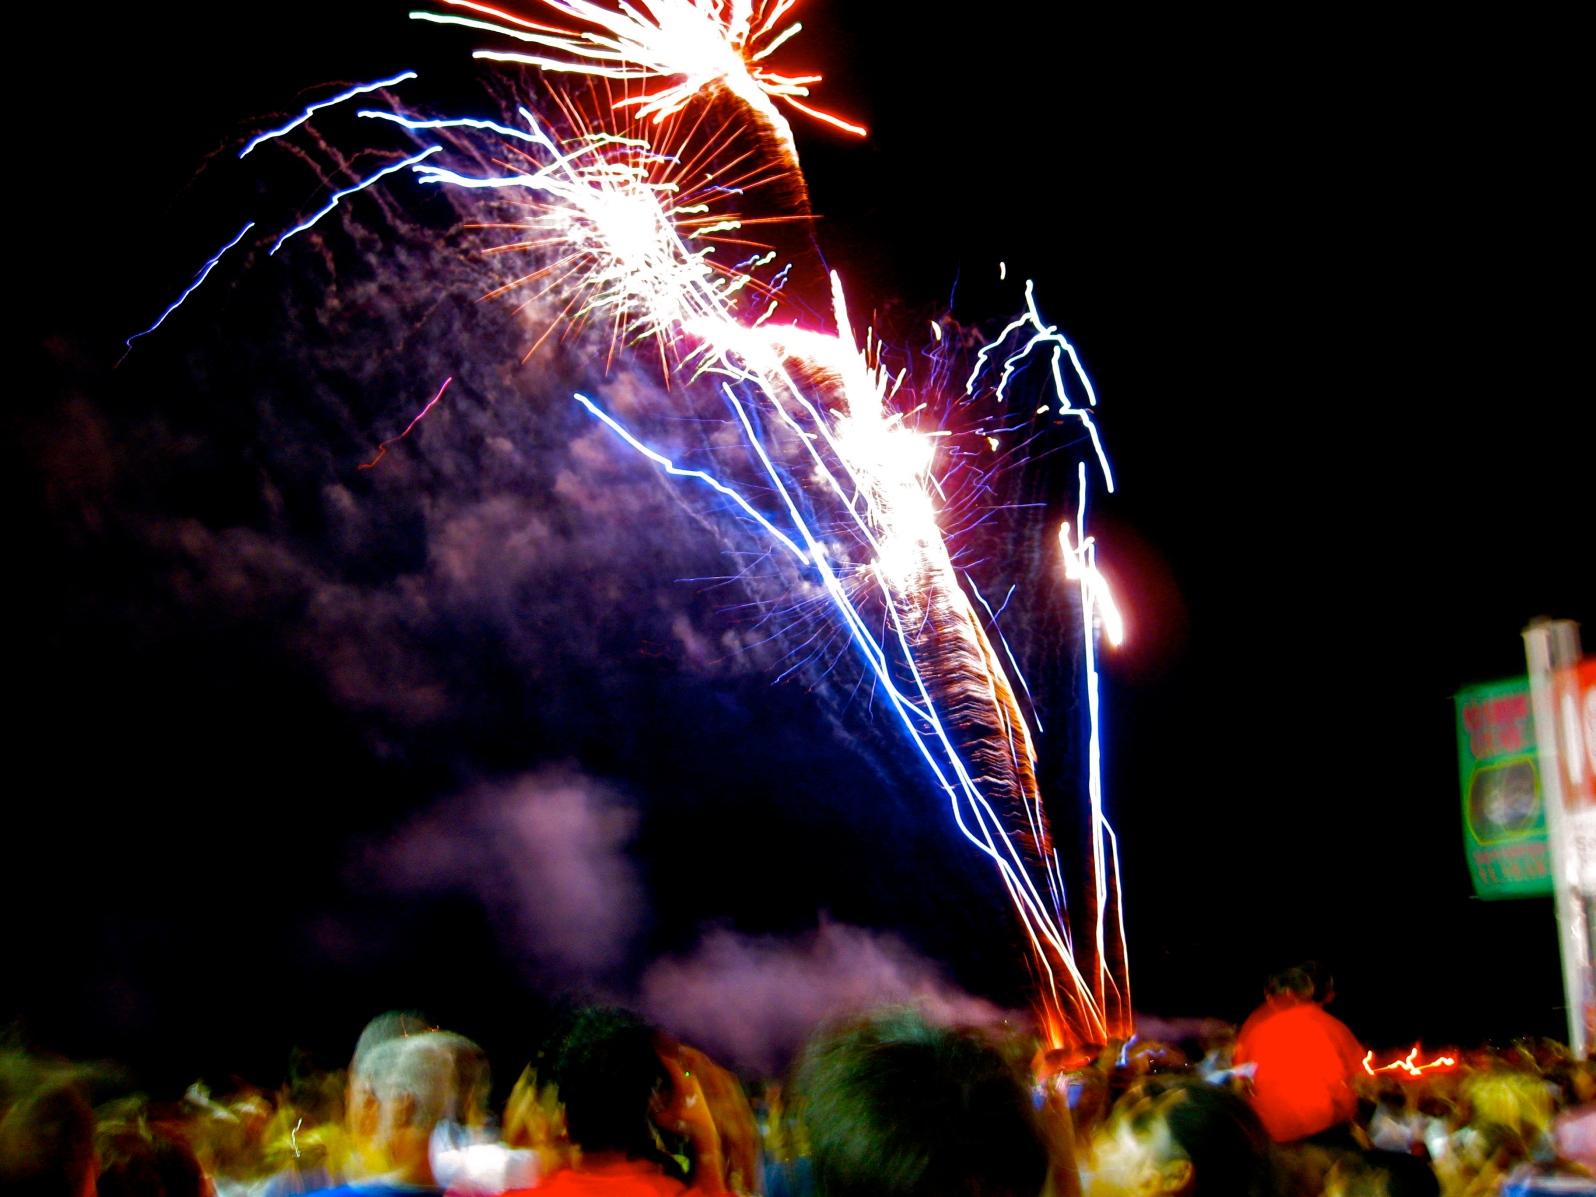 Fireworks from Casino Pier, Seaside Heights, NJ